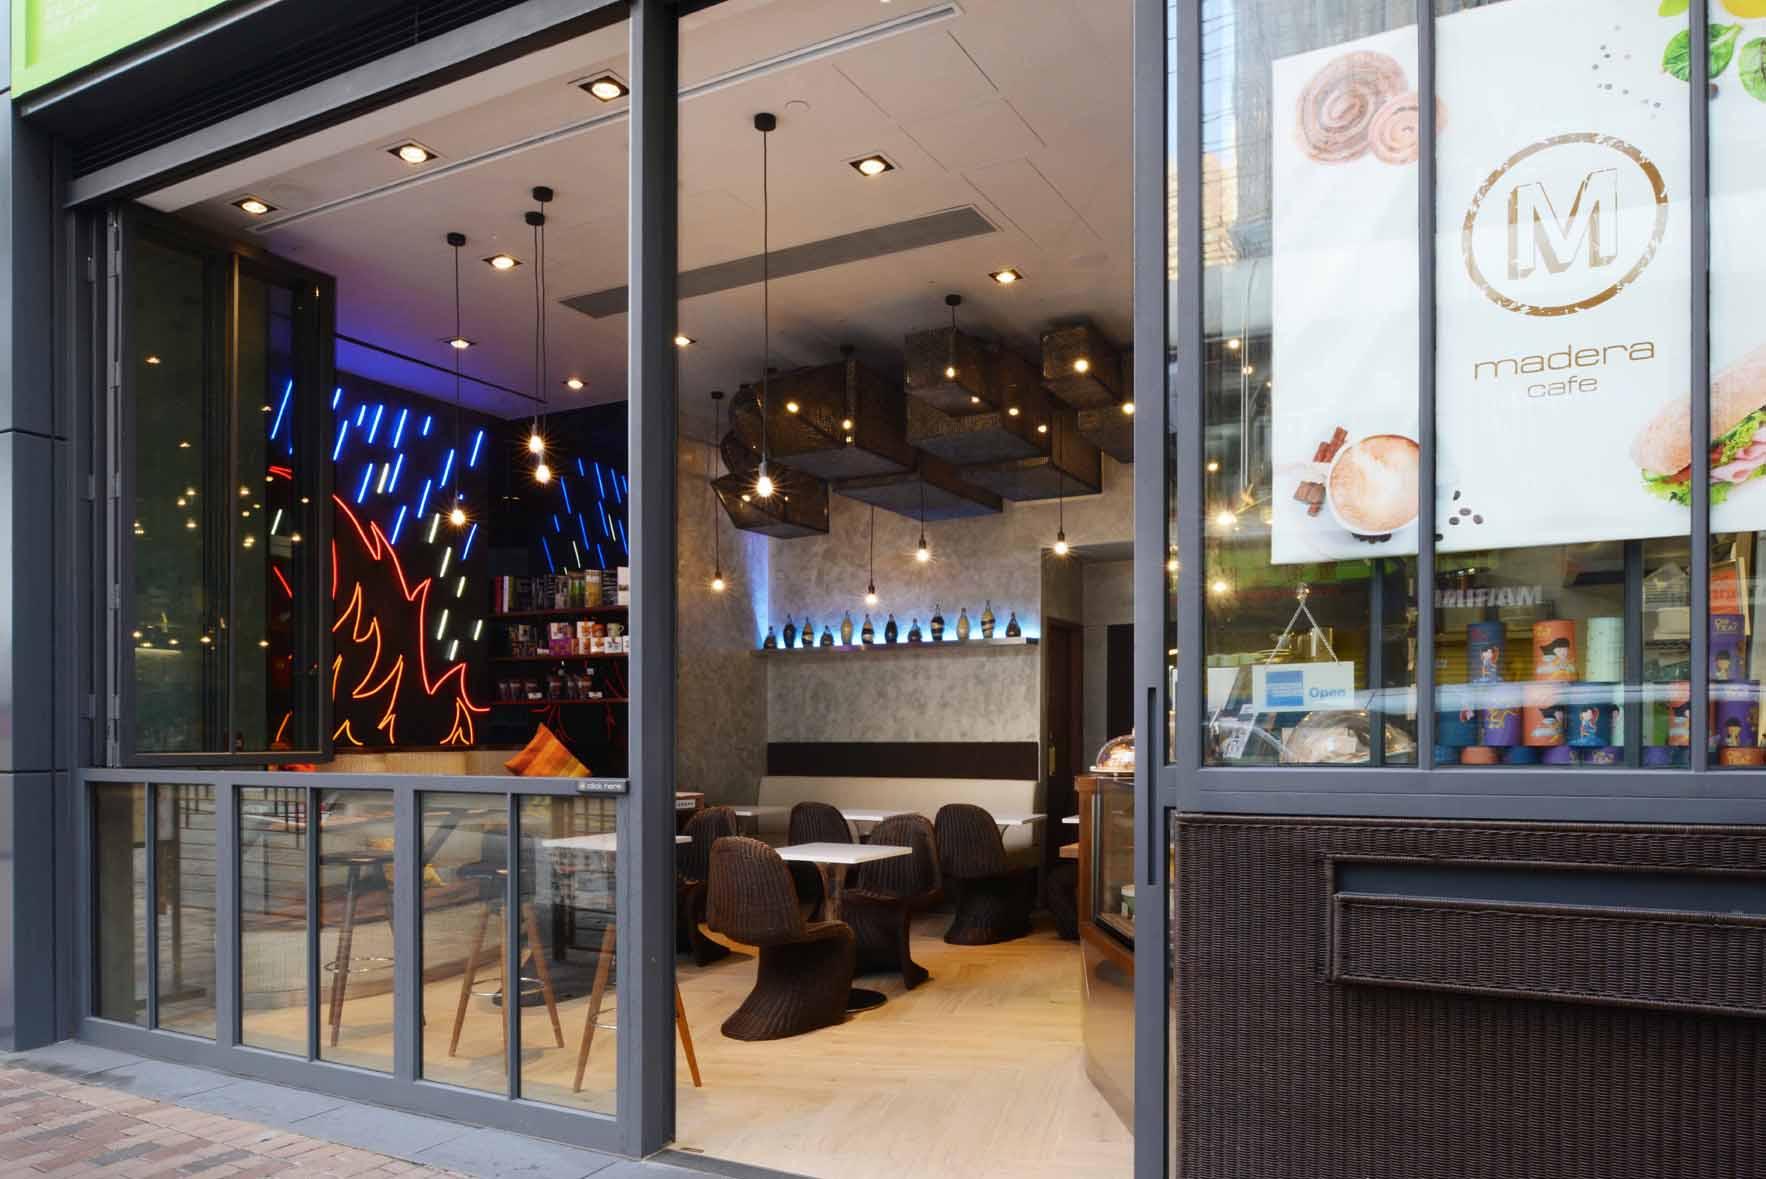 Stefano Tordiglione Design-Madera Cafe 5.jpg